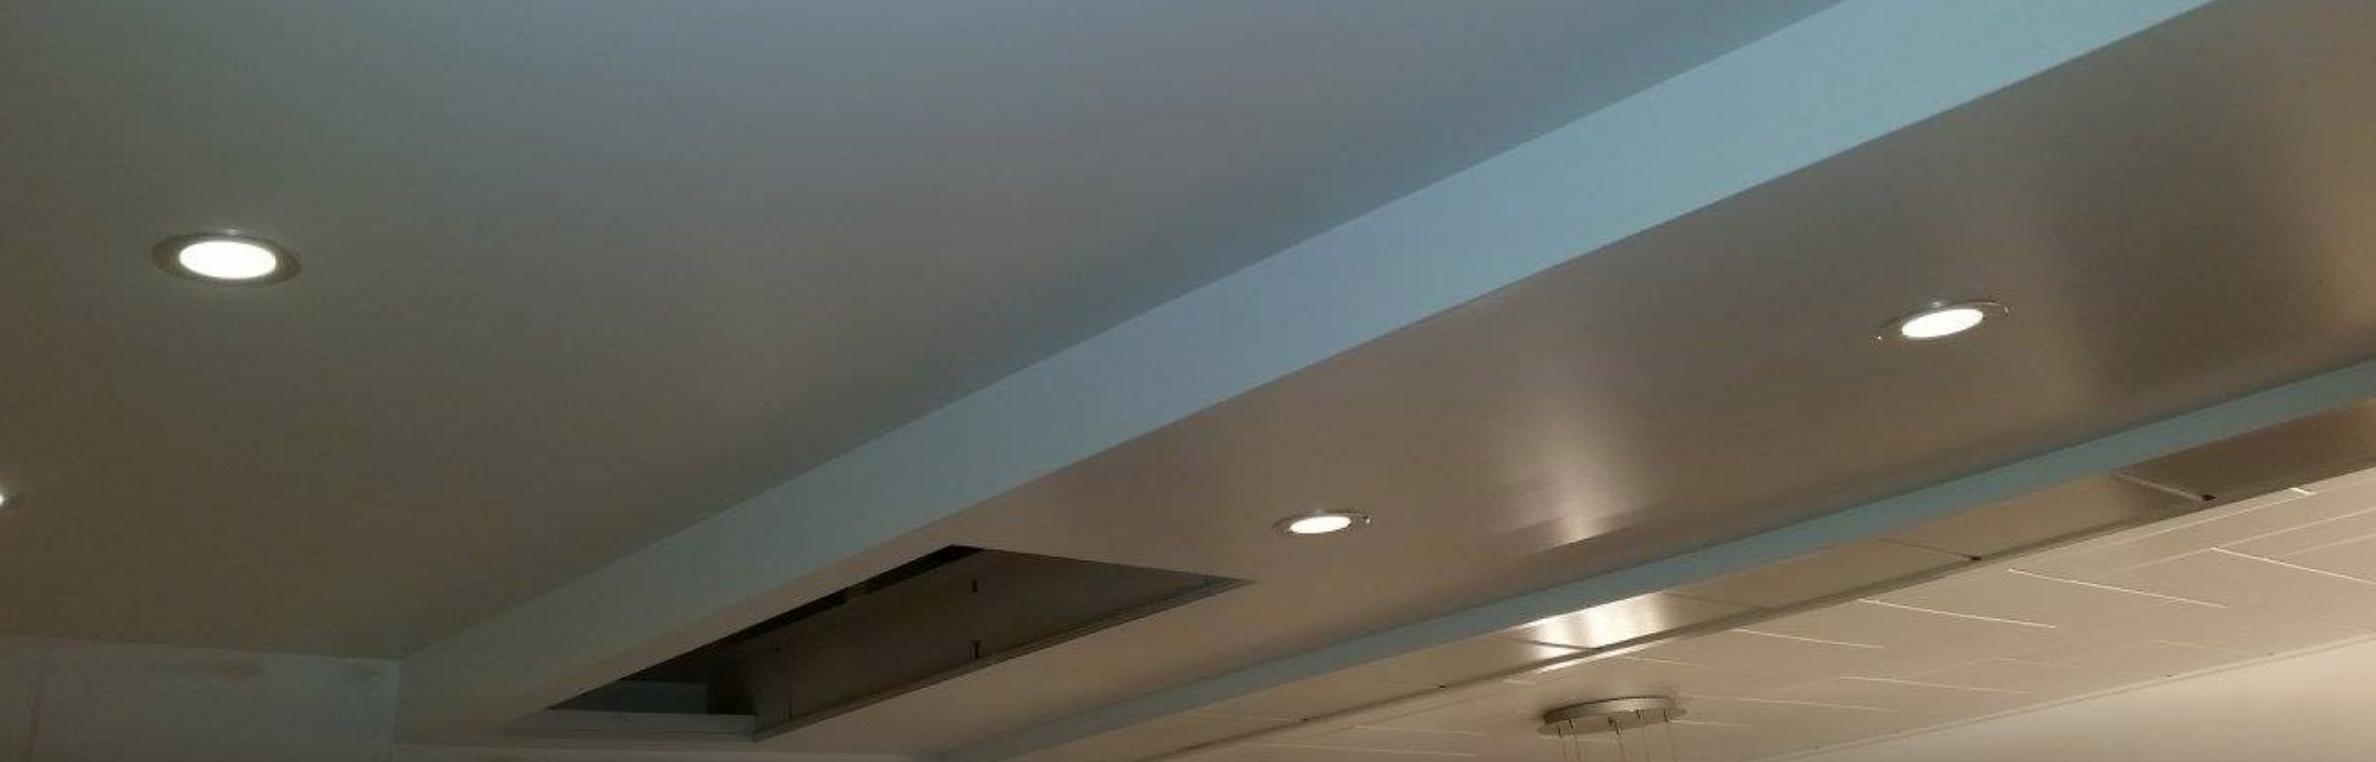 plafond spuiten 2